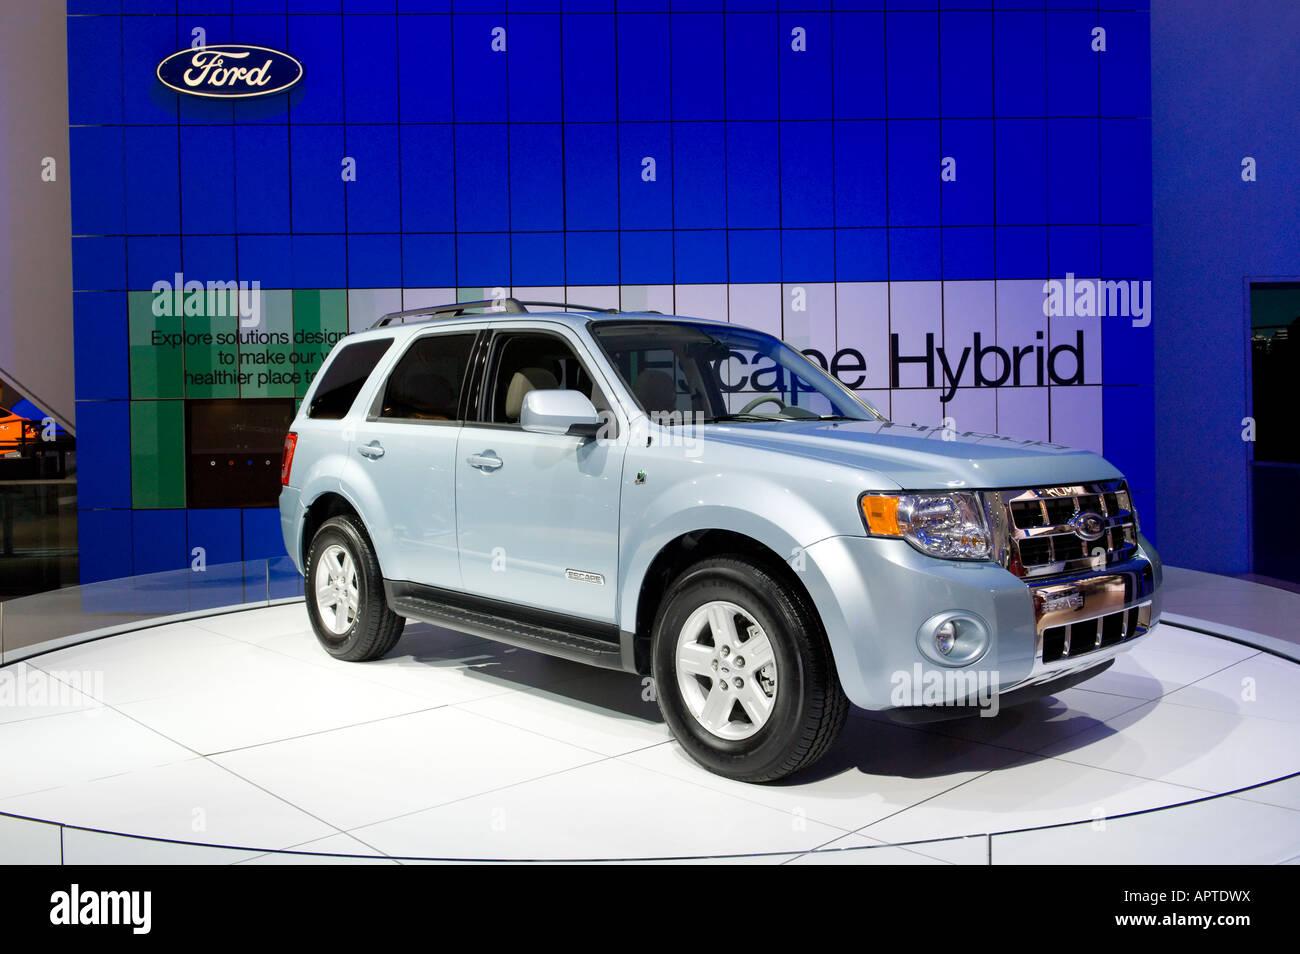 Ford escape hybrid suv at the 2008 north american international auto show in detroit michigan usa